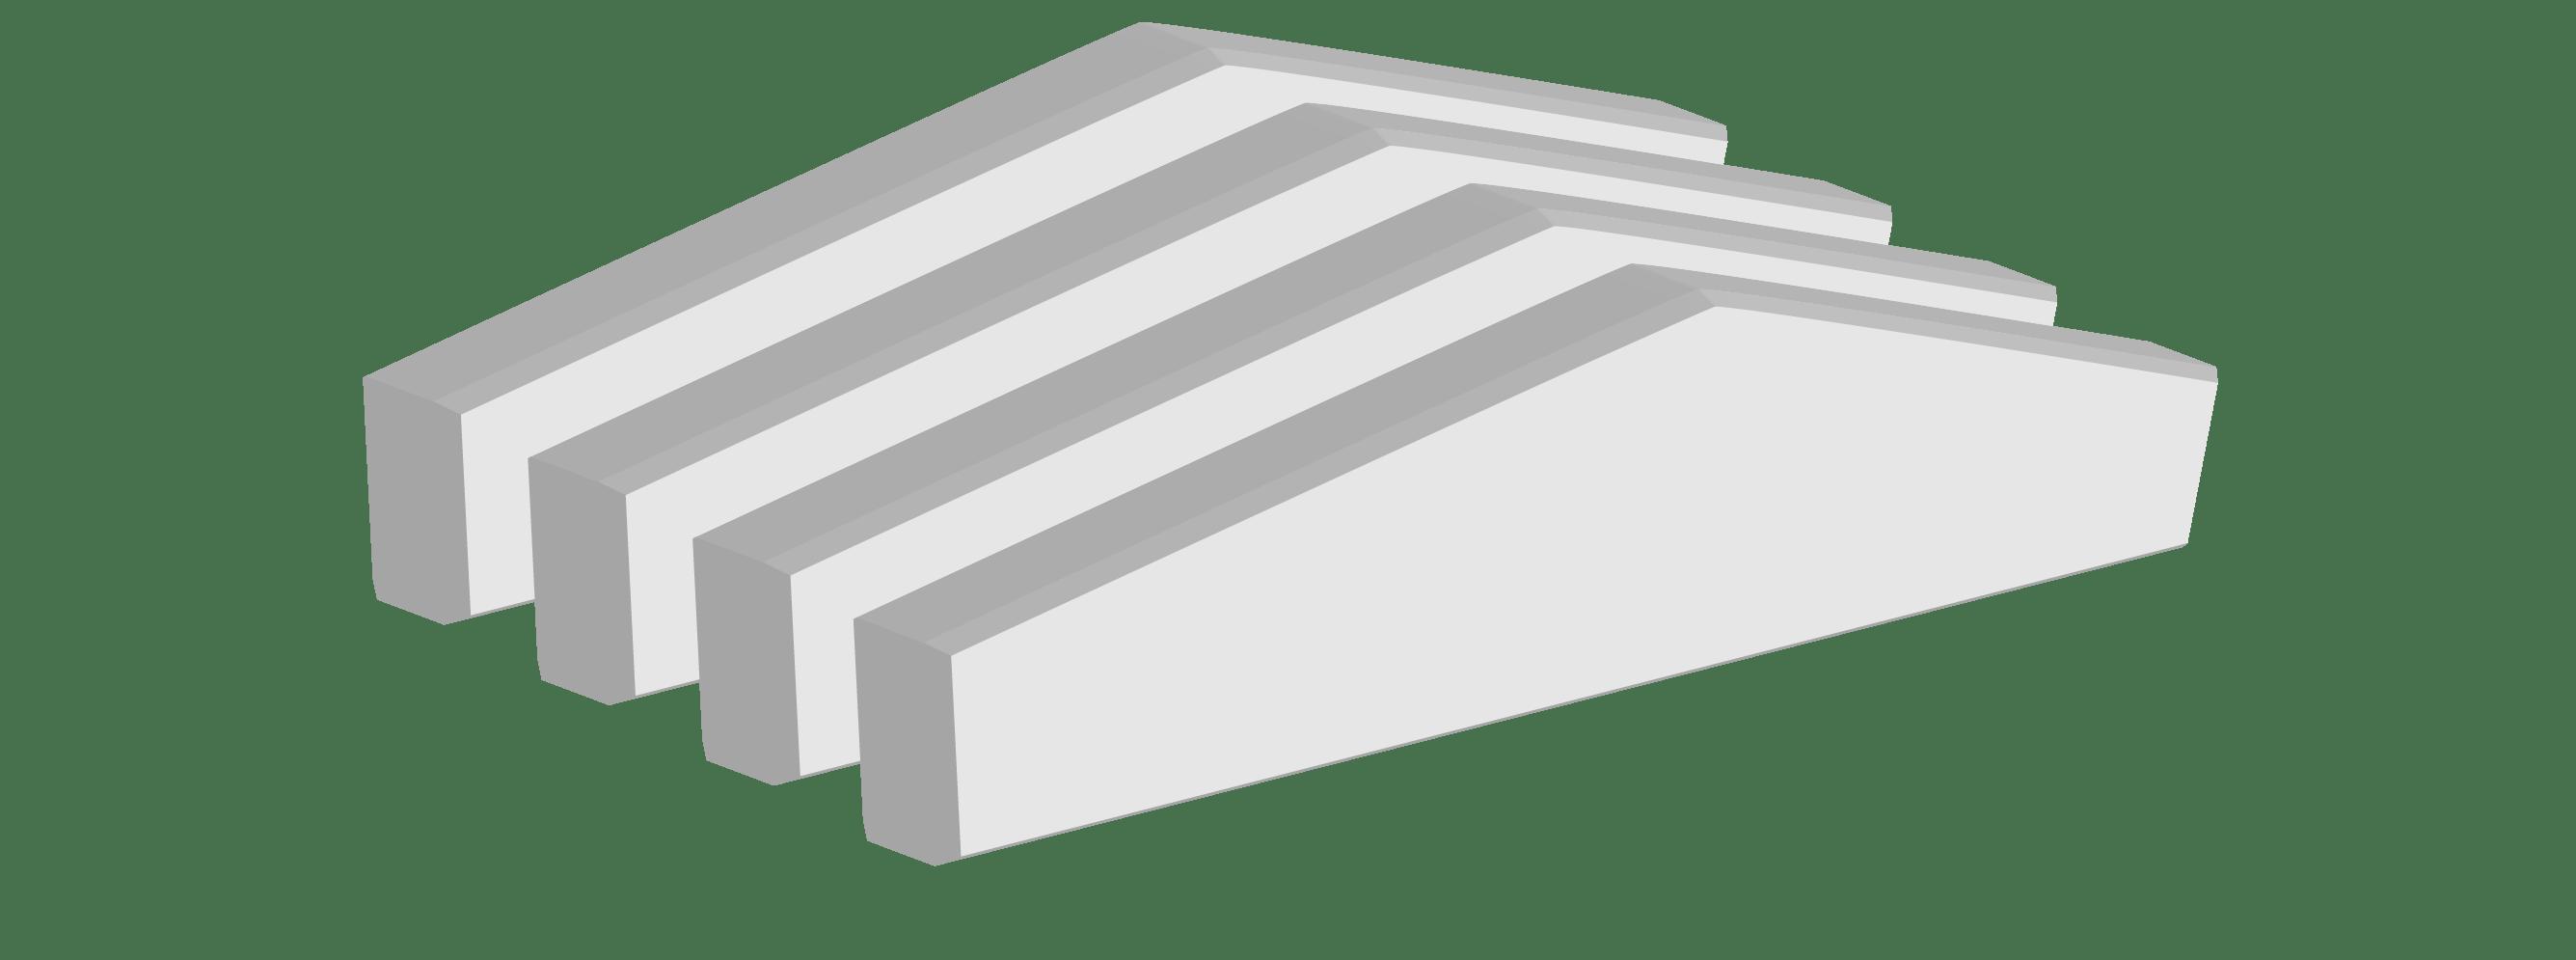 Structures en acier